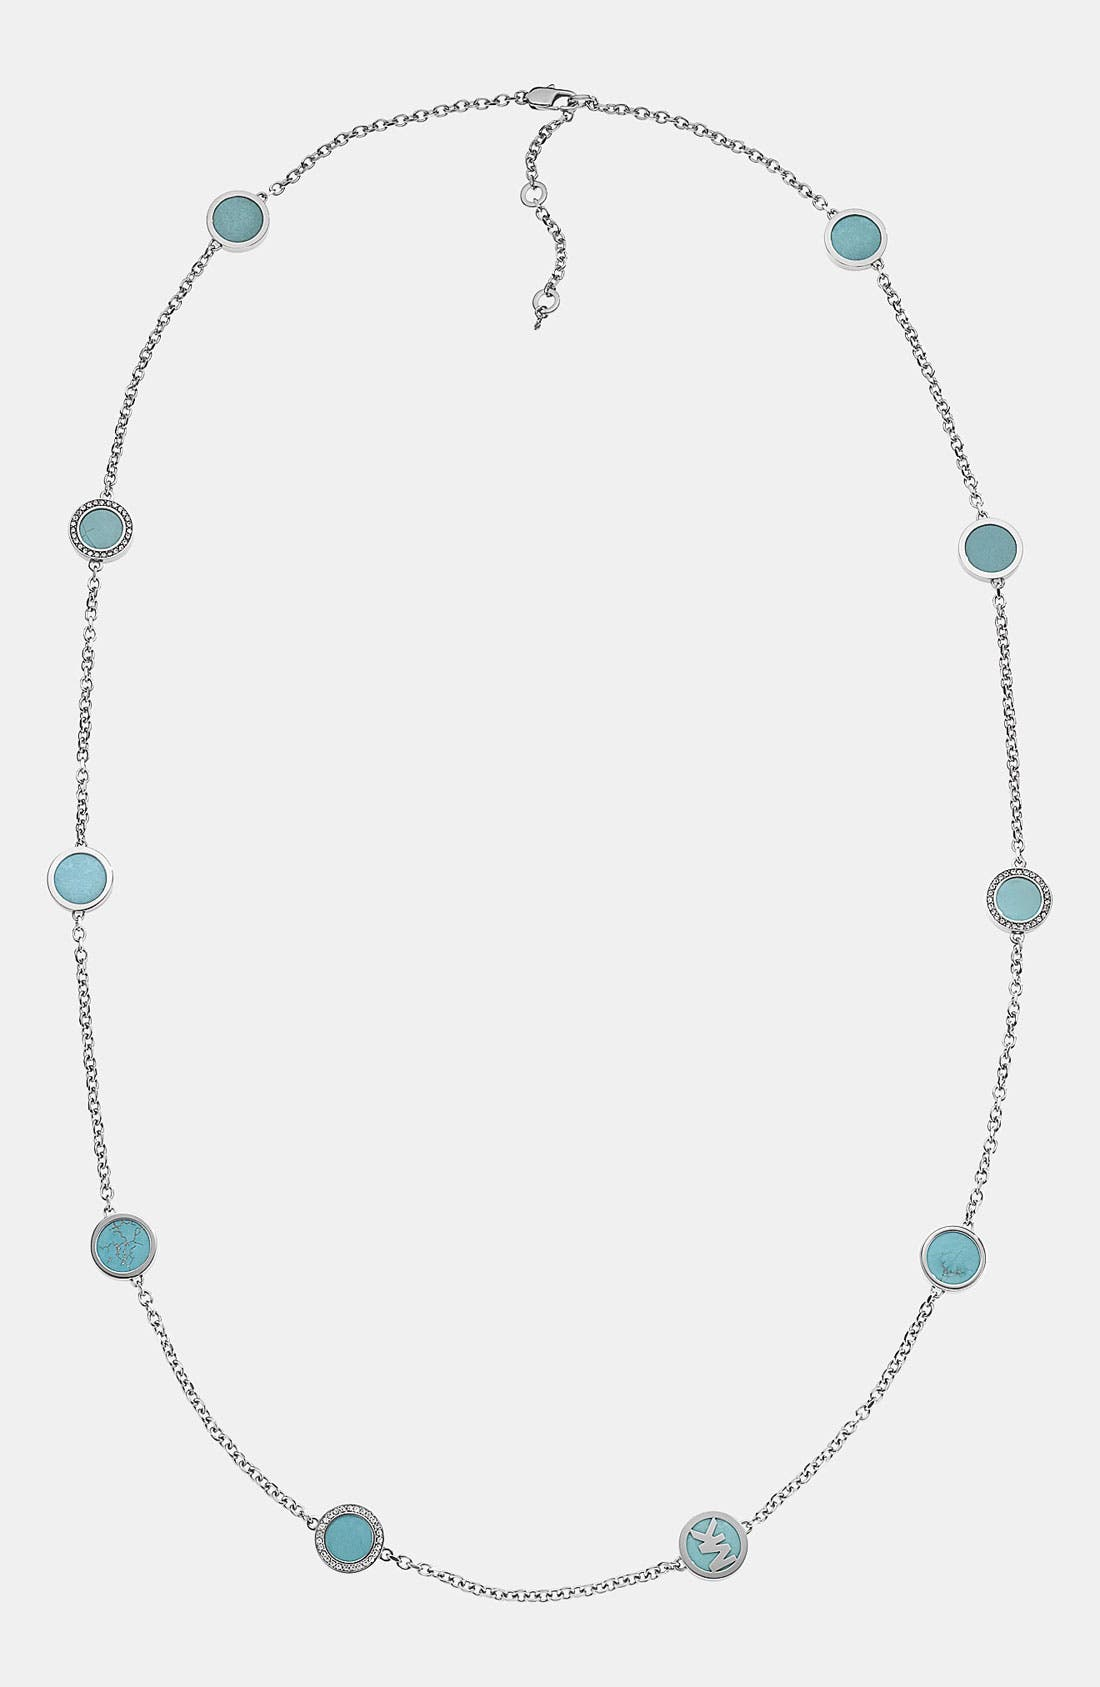 Main Image - Michael Kors Long Station Necklace